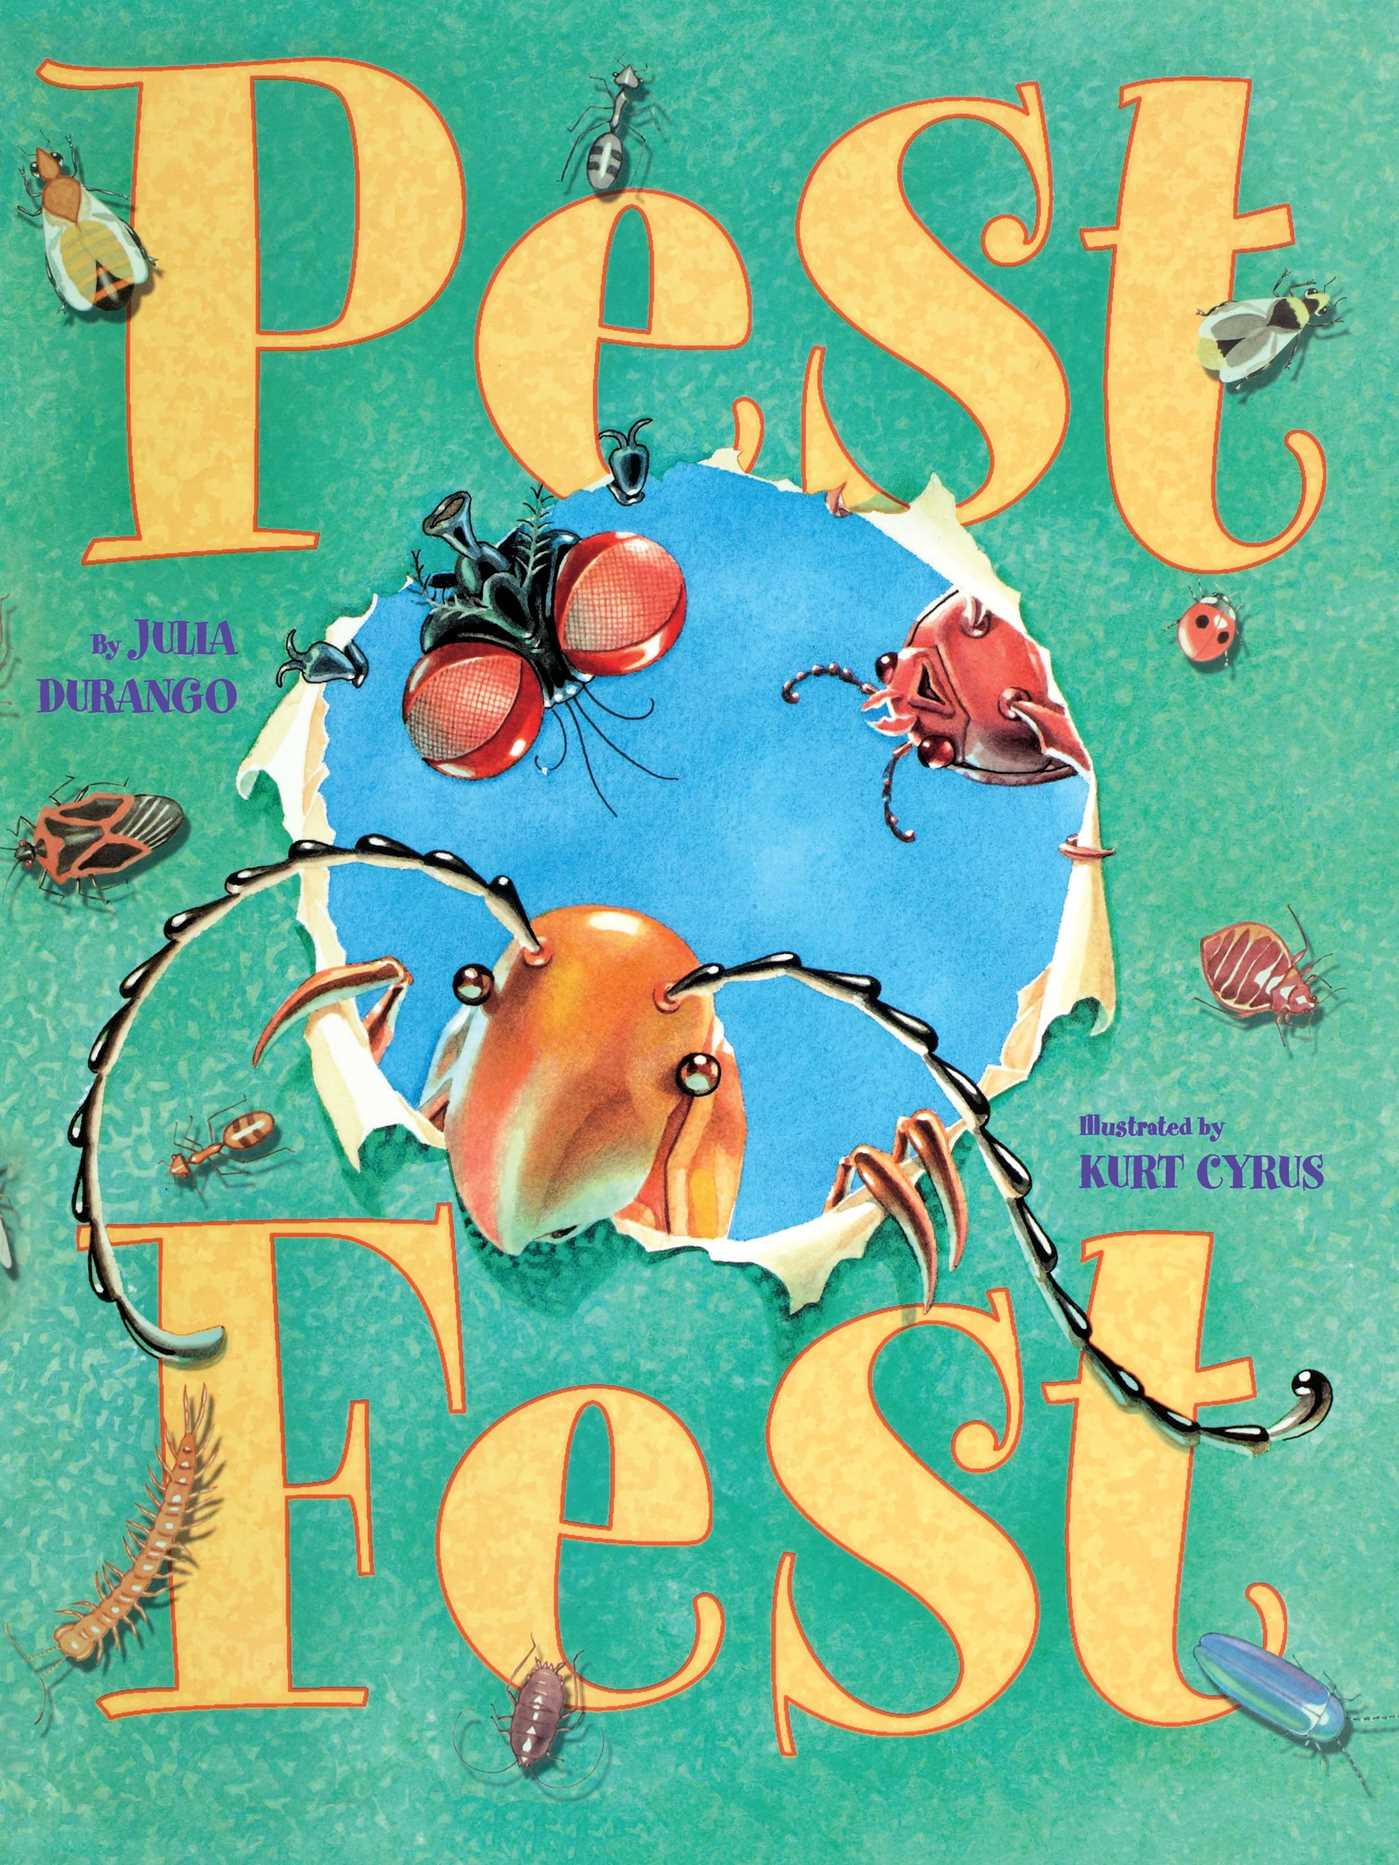 Pest fest 9781442430952 hr